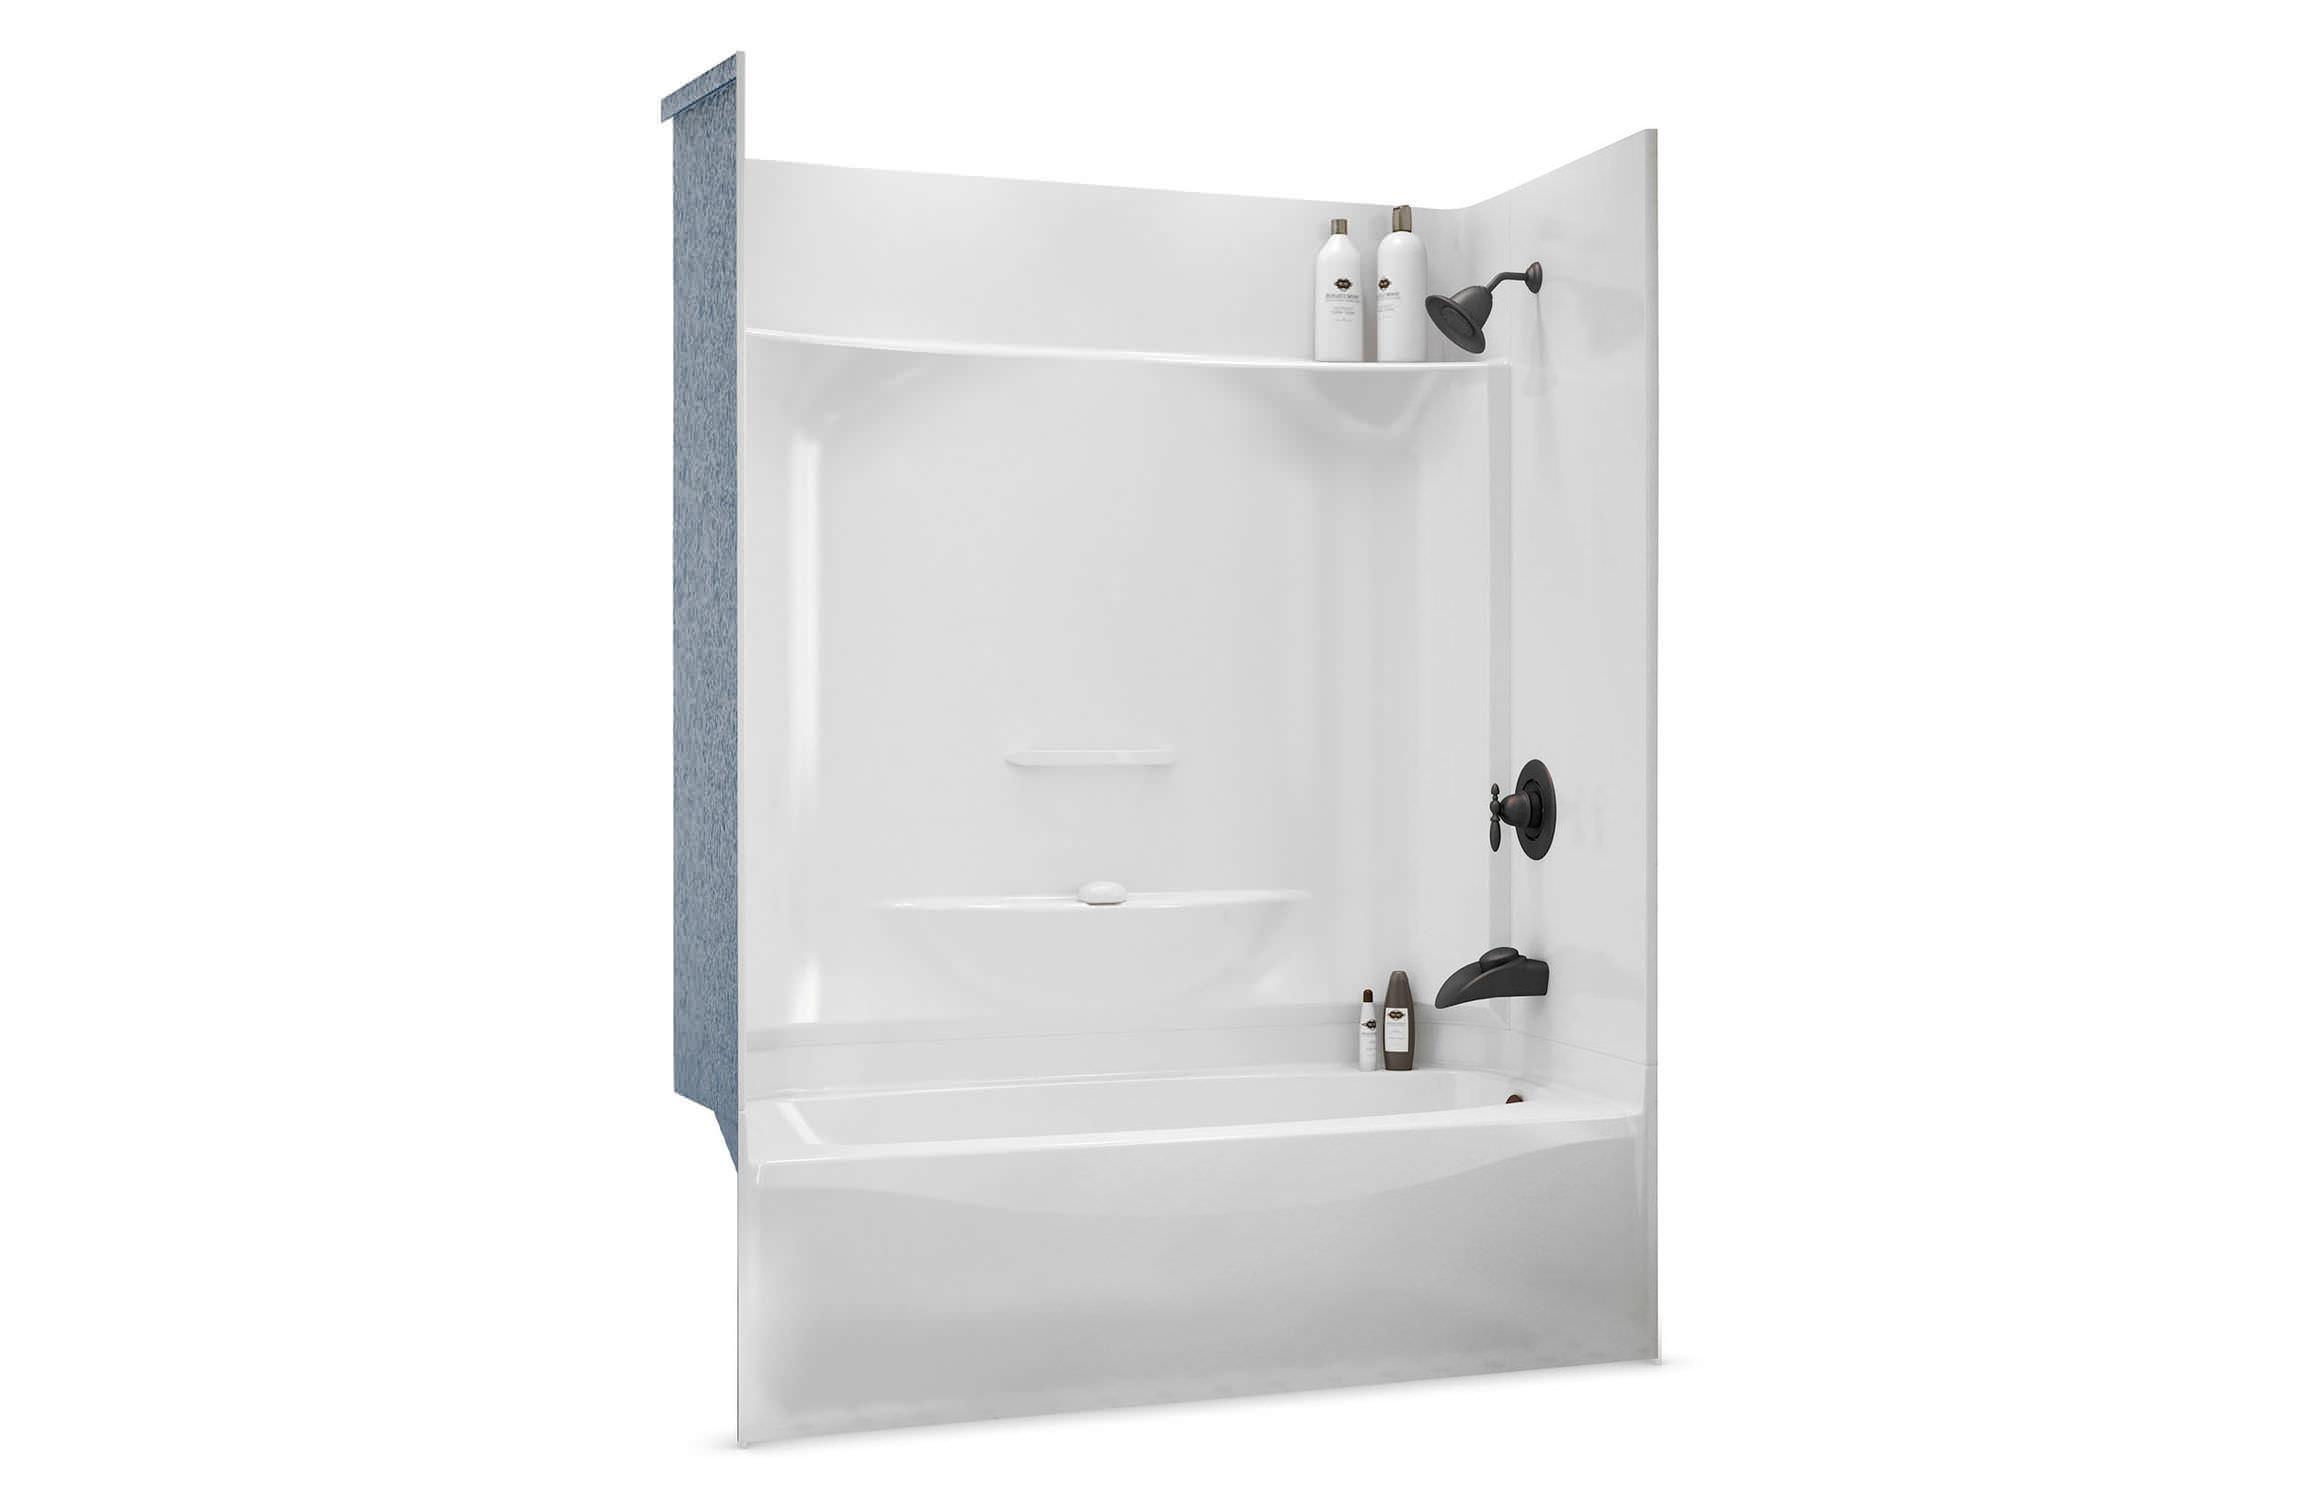 Vasca Da Bagno Rettangolare Incasso : Vasca da bagno doccia da incasso rettangolare in acrilico